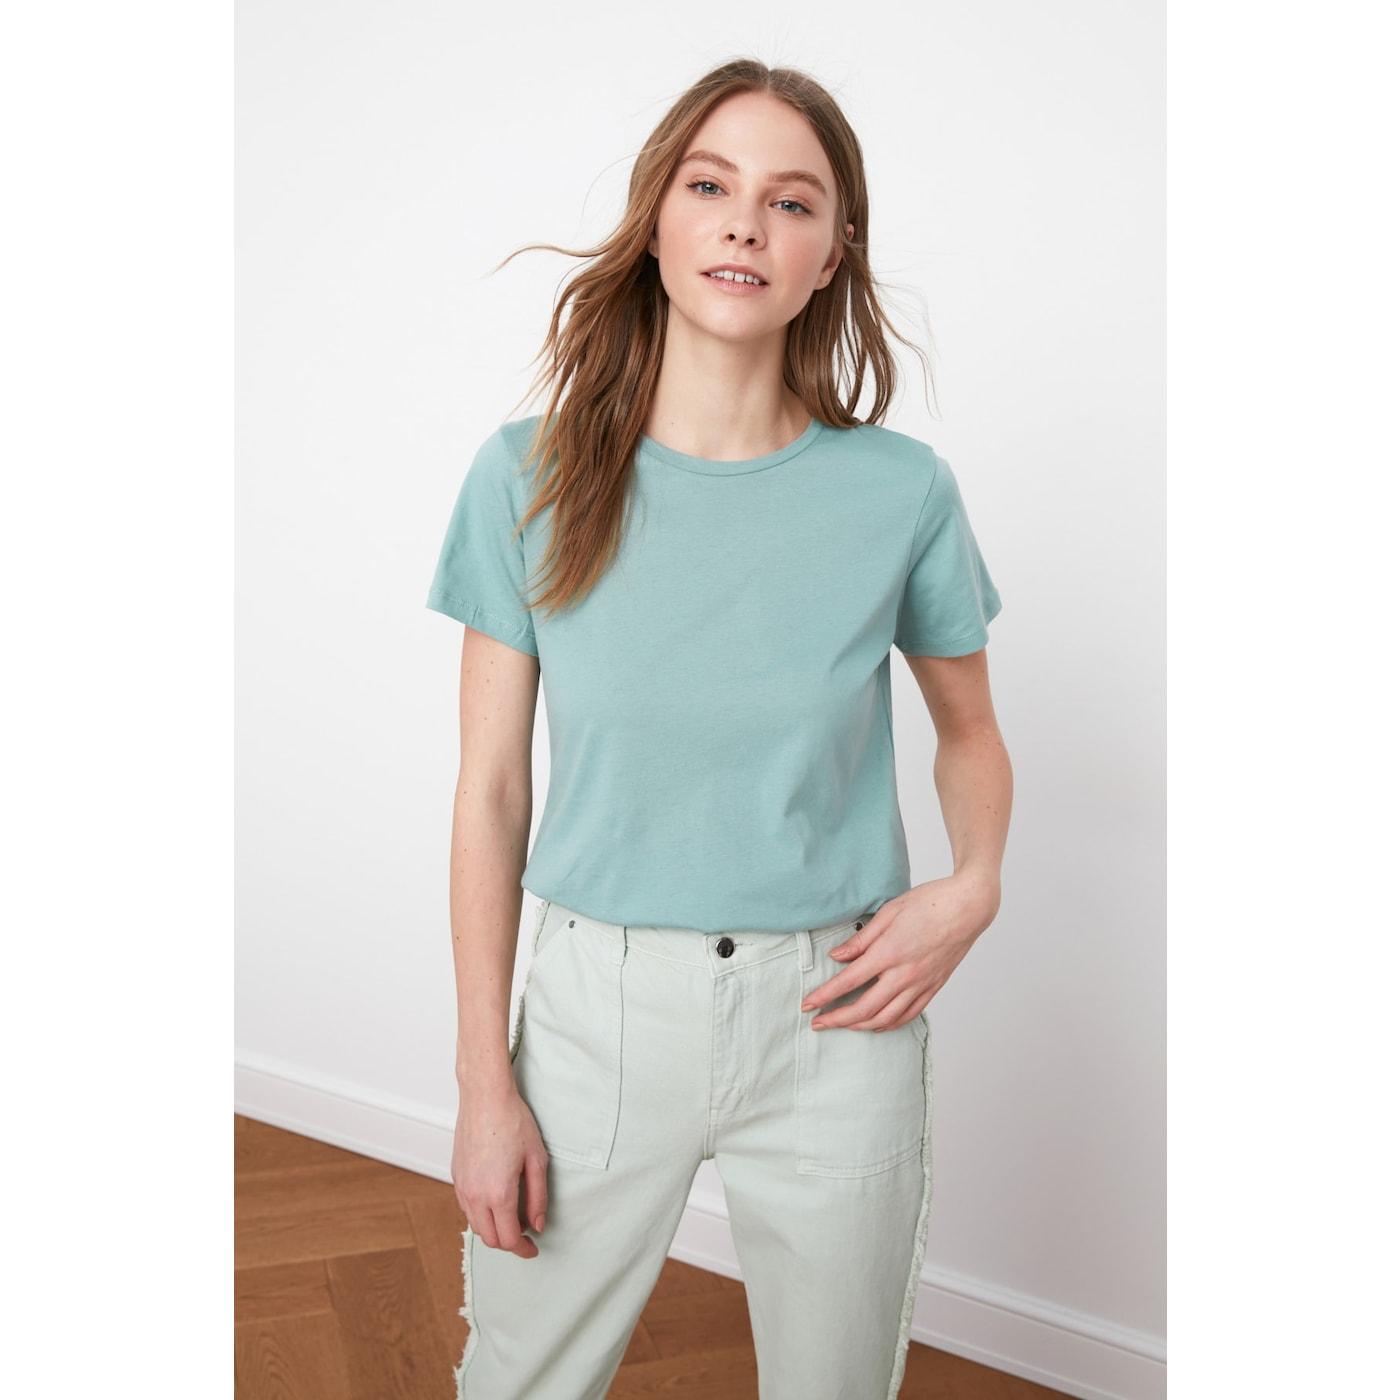 Trendyol Mint 100% Cotton Süprem Bicycle Collar Basic Knitted T-Shirt dámské L